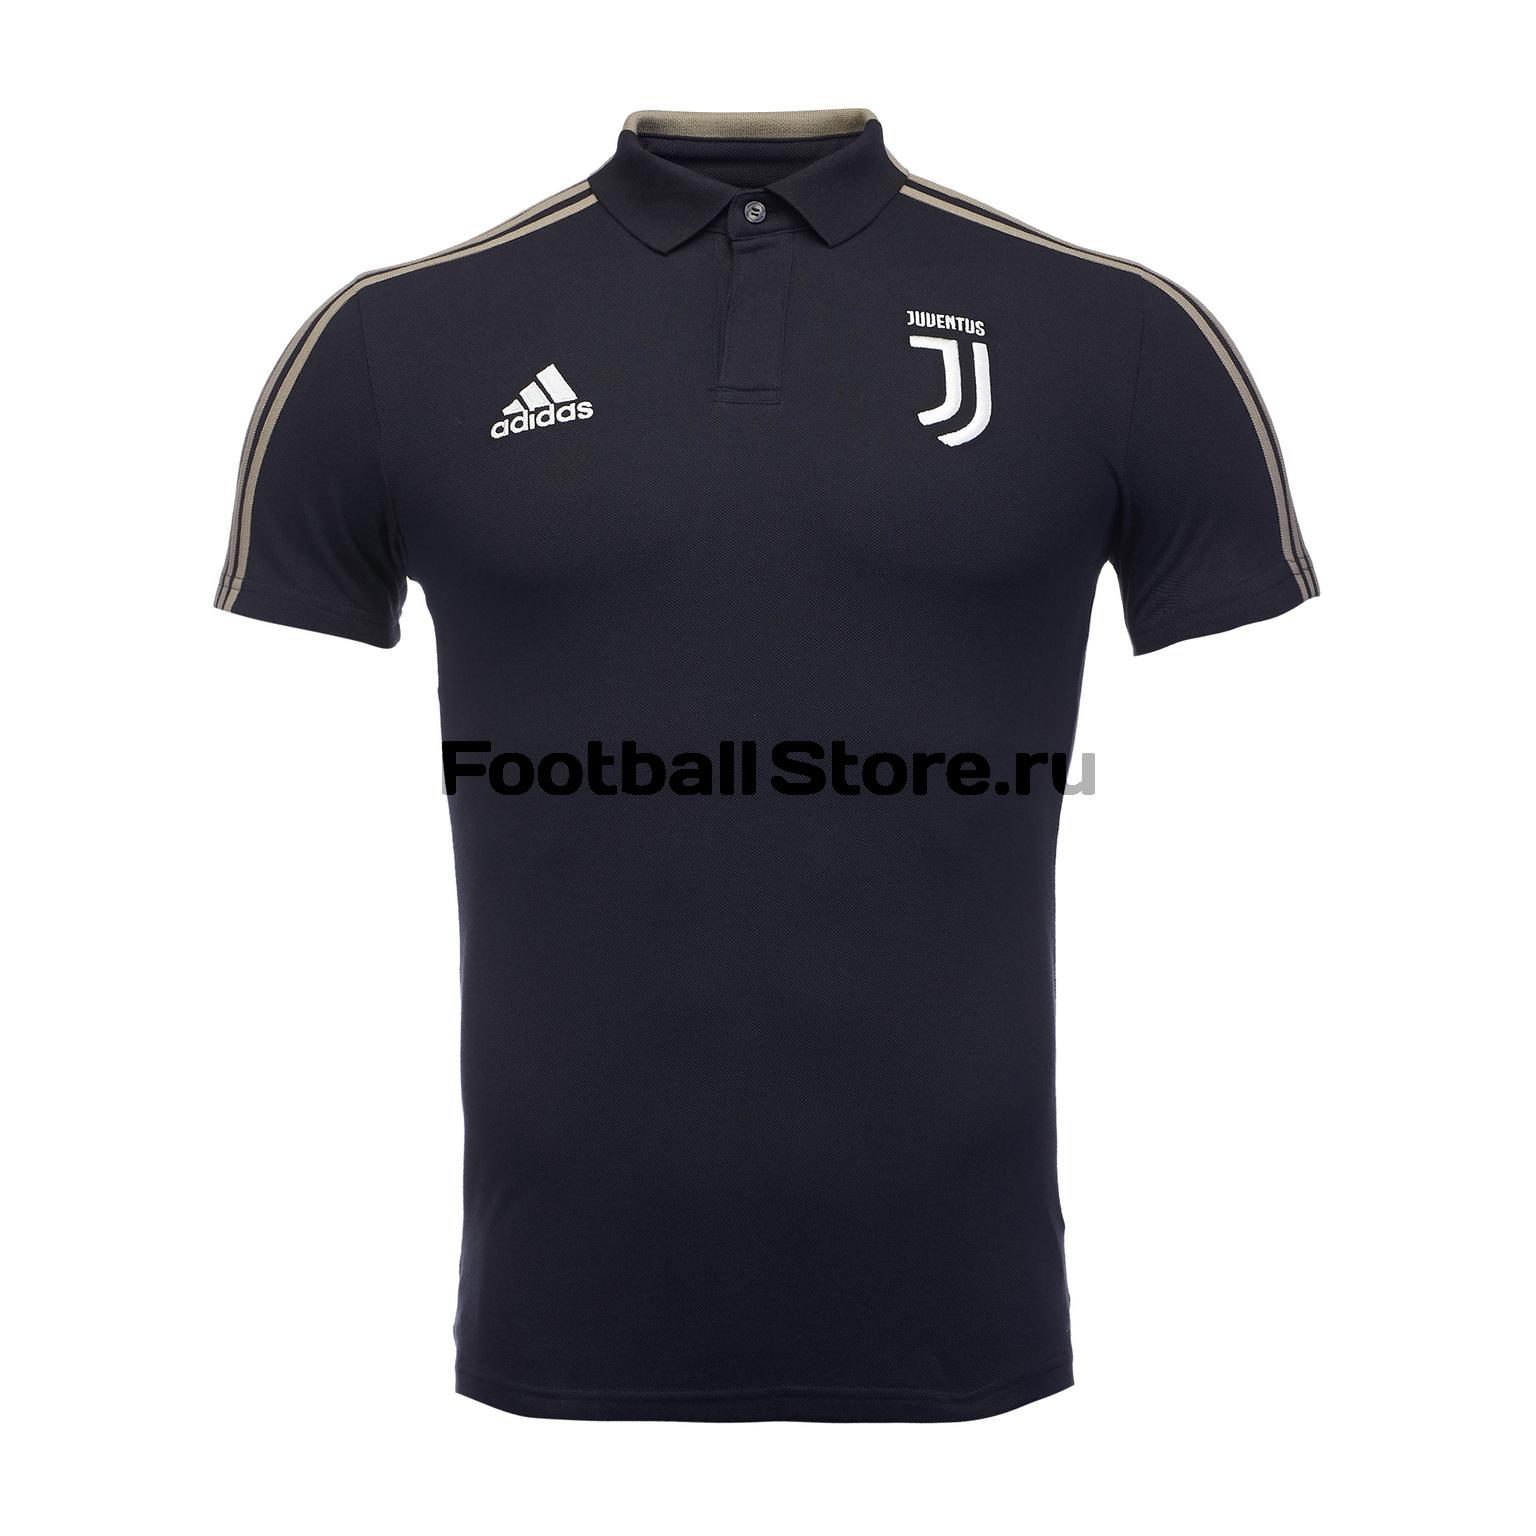 Рубашка-поло Adidas Juventus 2018/19 рюкзак adidas juventus 2018 19